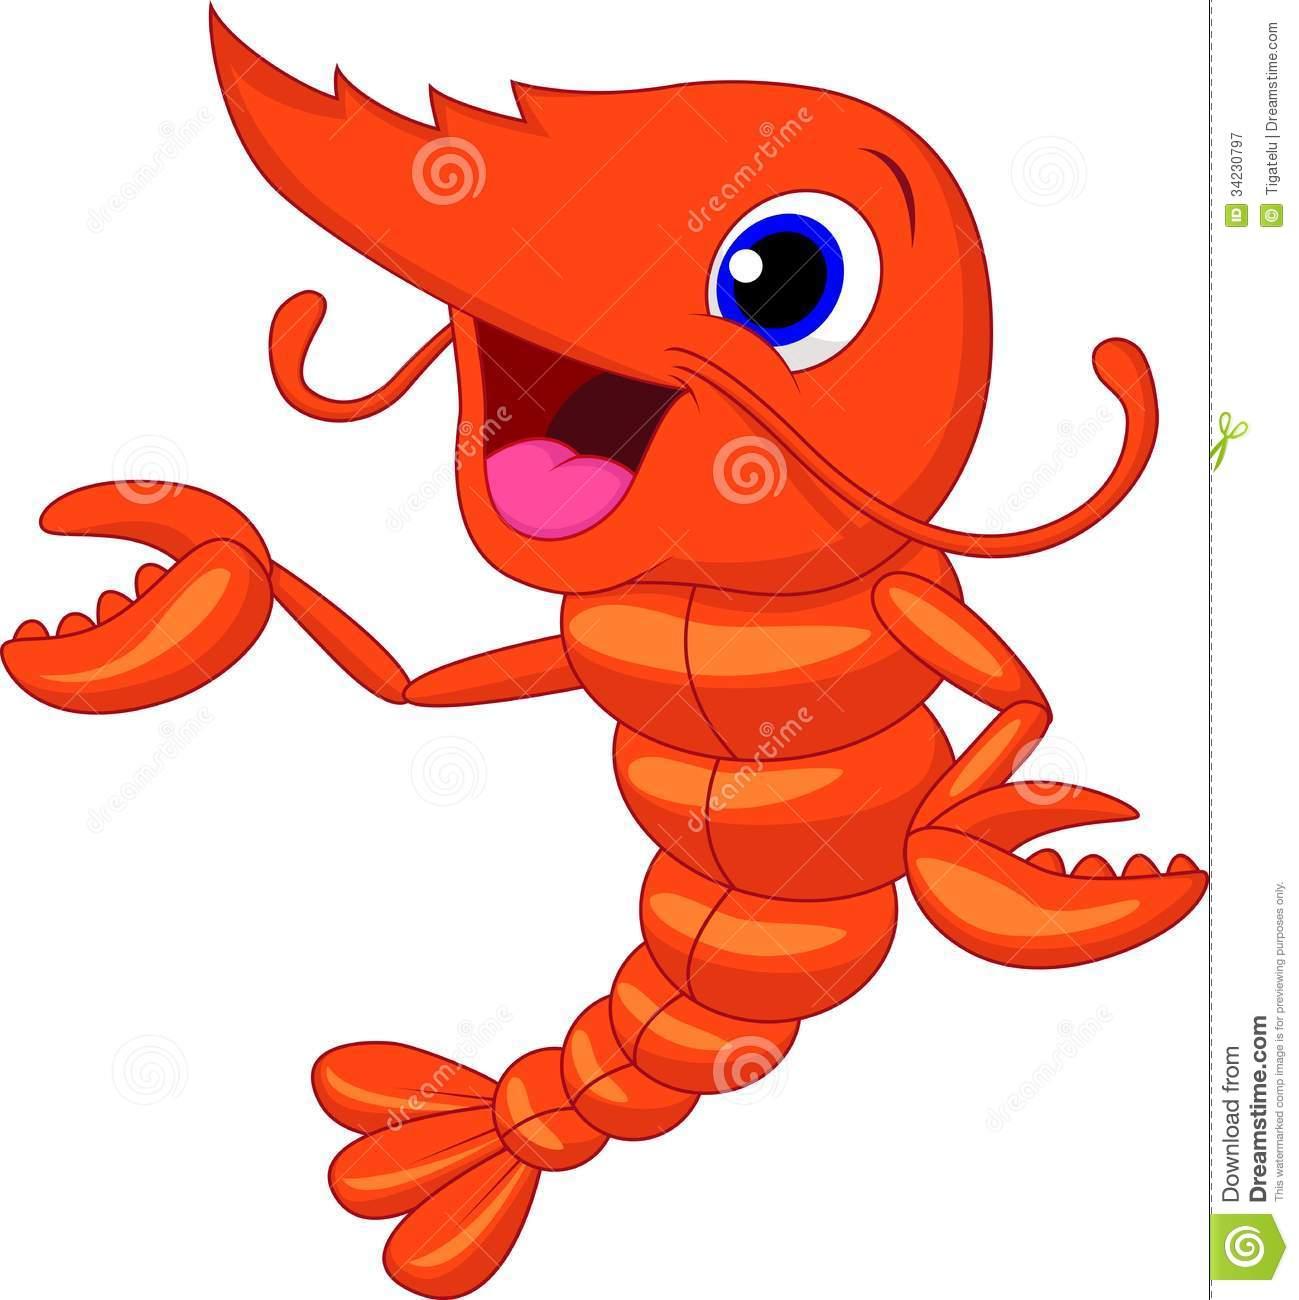 7 cartoon shrimp character